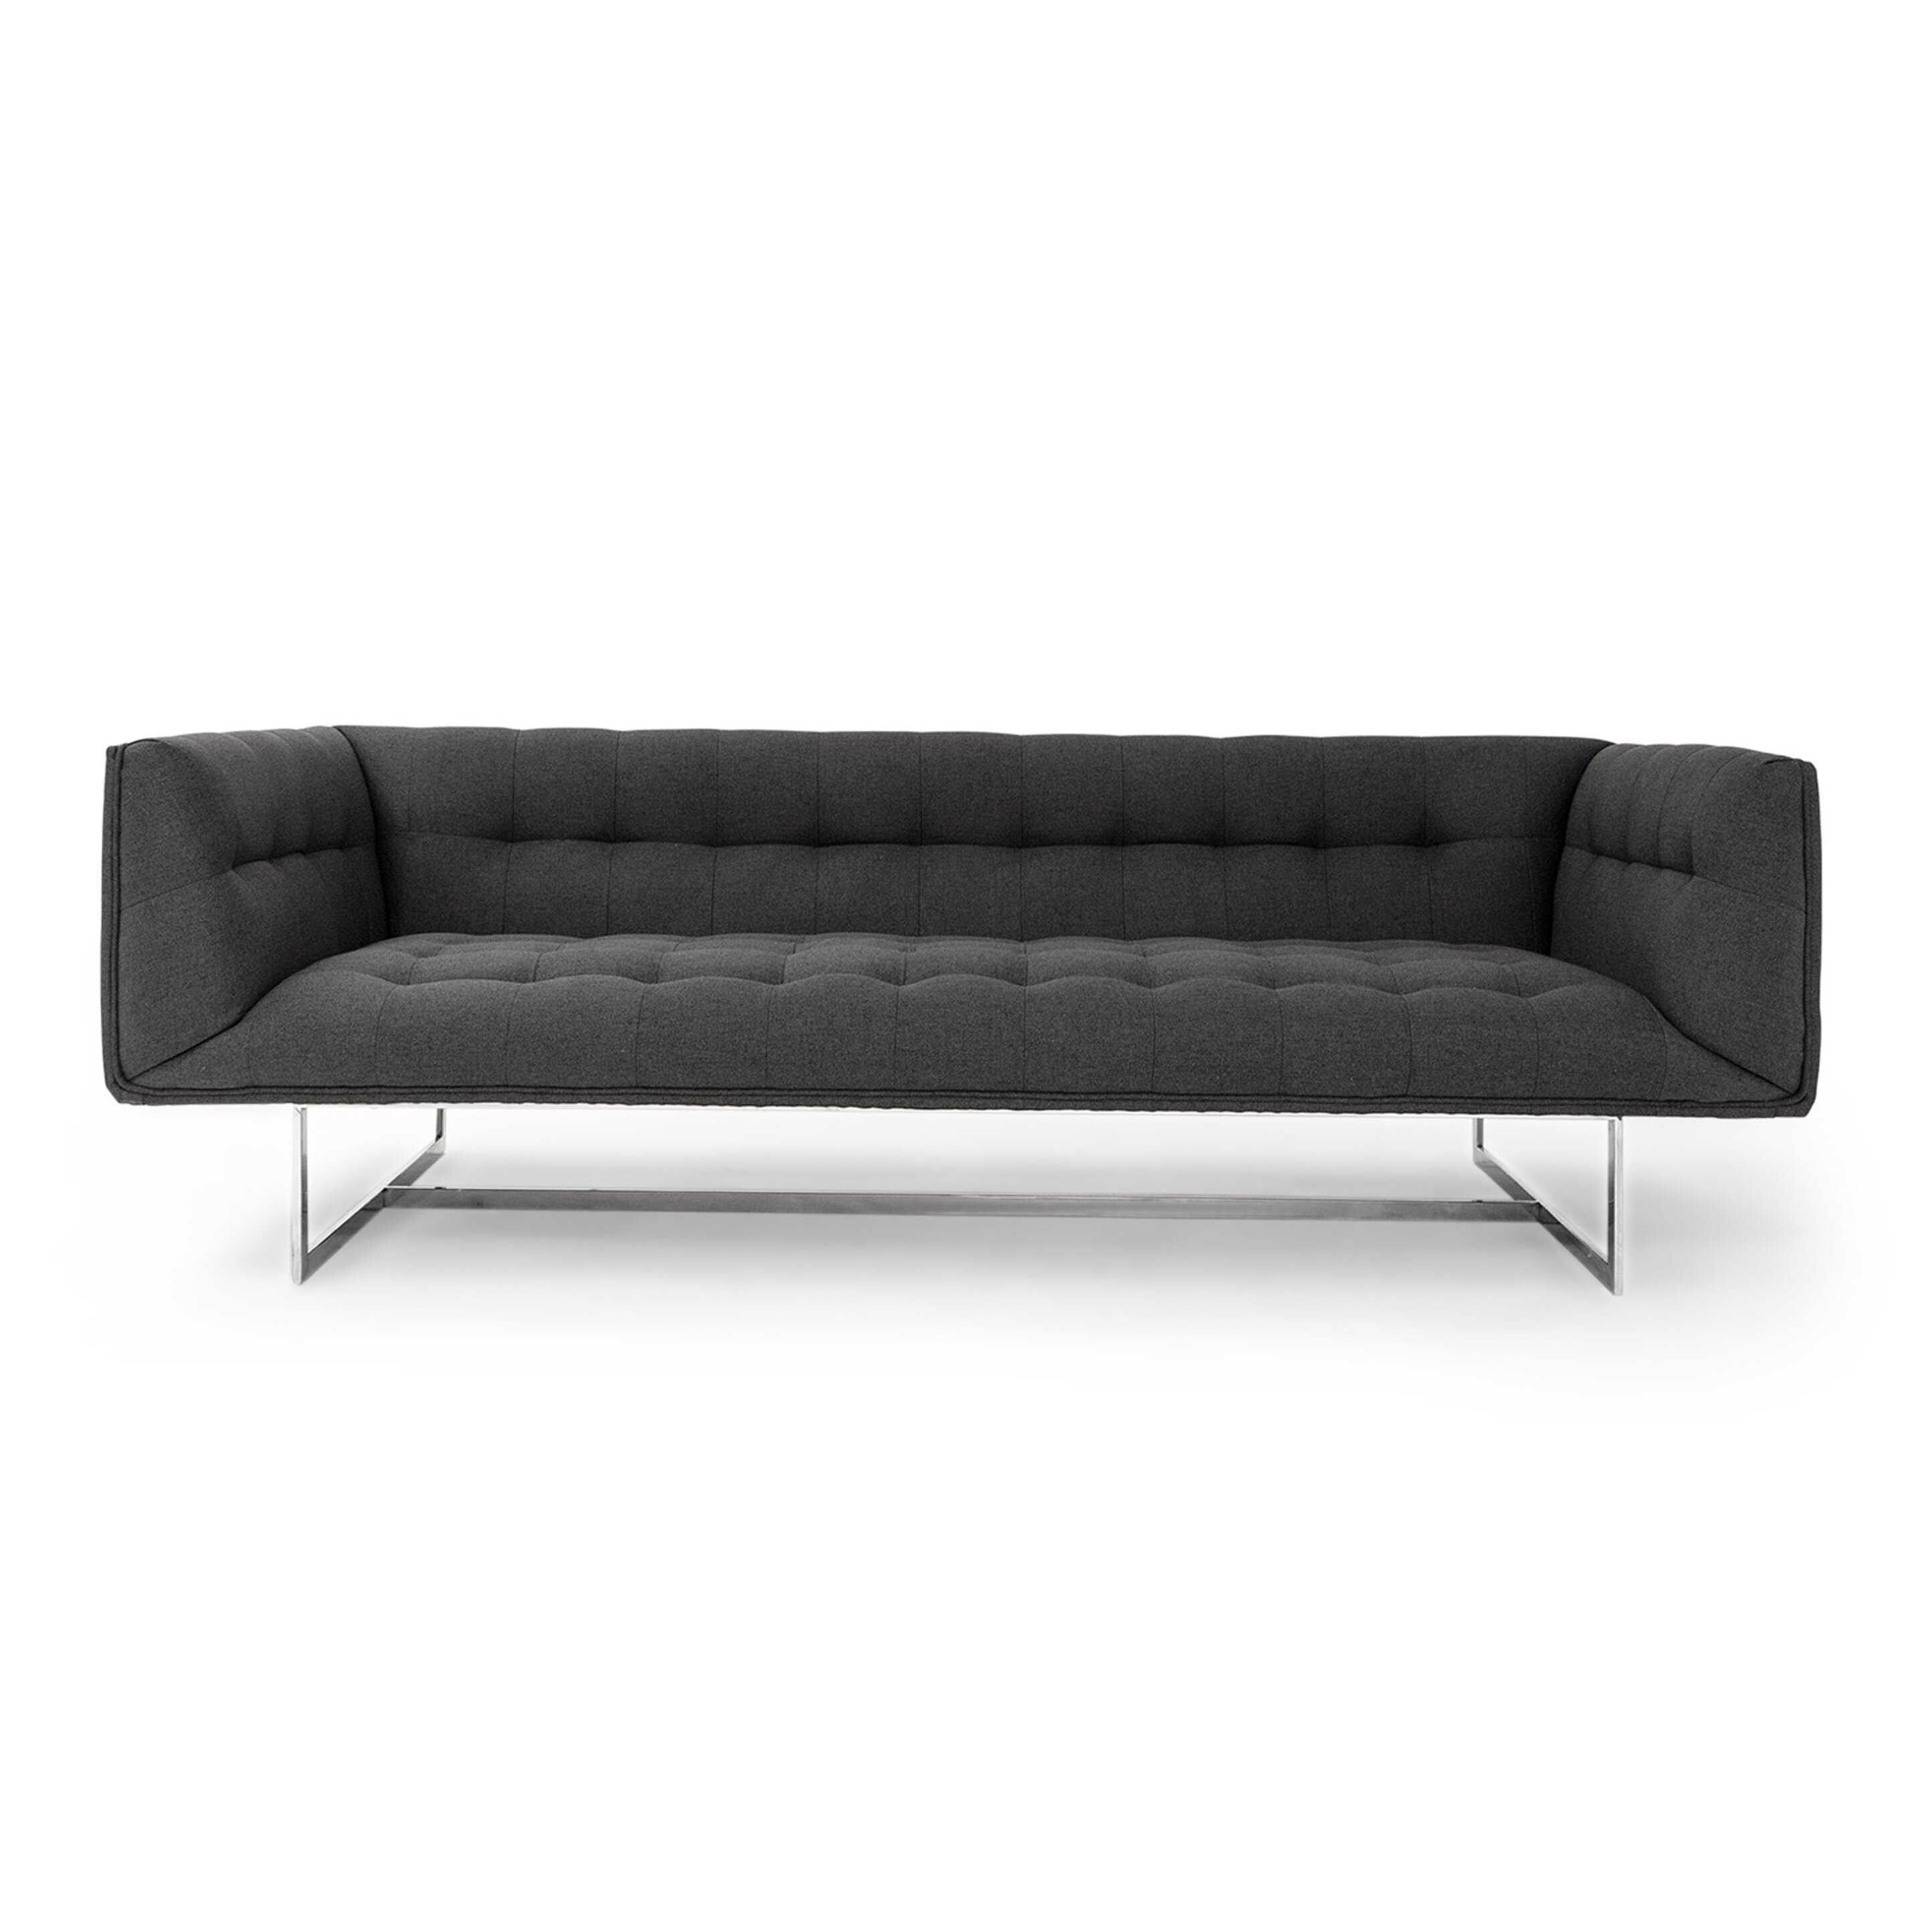 kardiel edward mid century modern sofa reviews wayfair. Black Bedroom Furniture Sets. Home Design Ideas